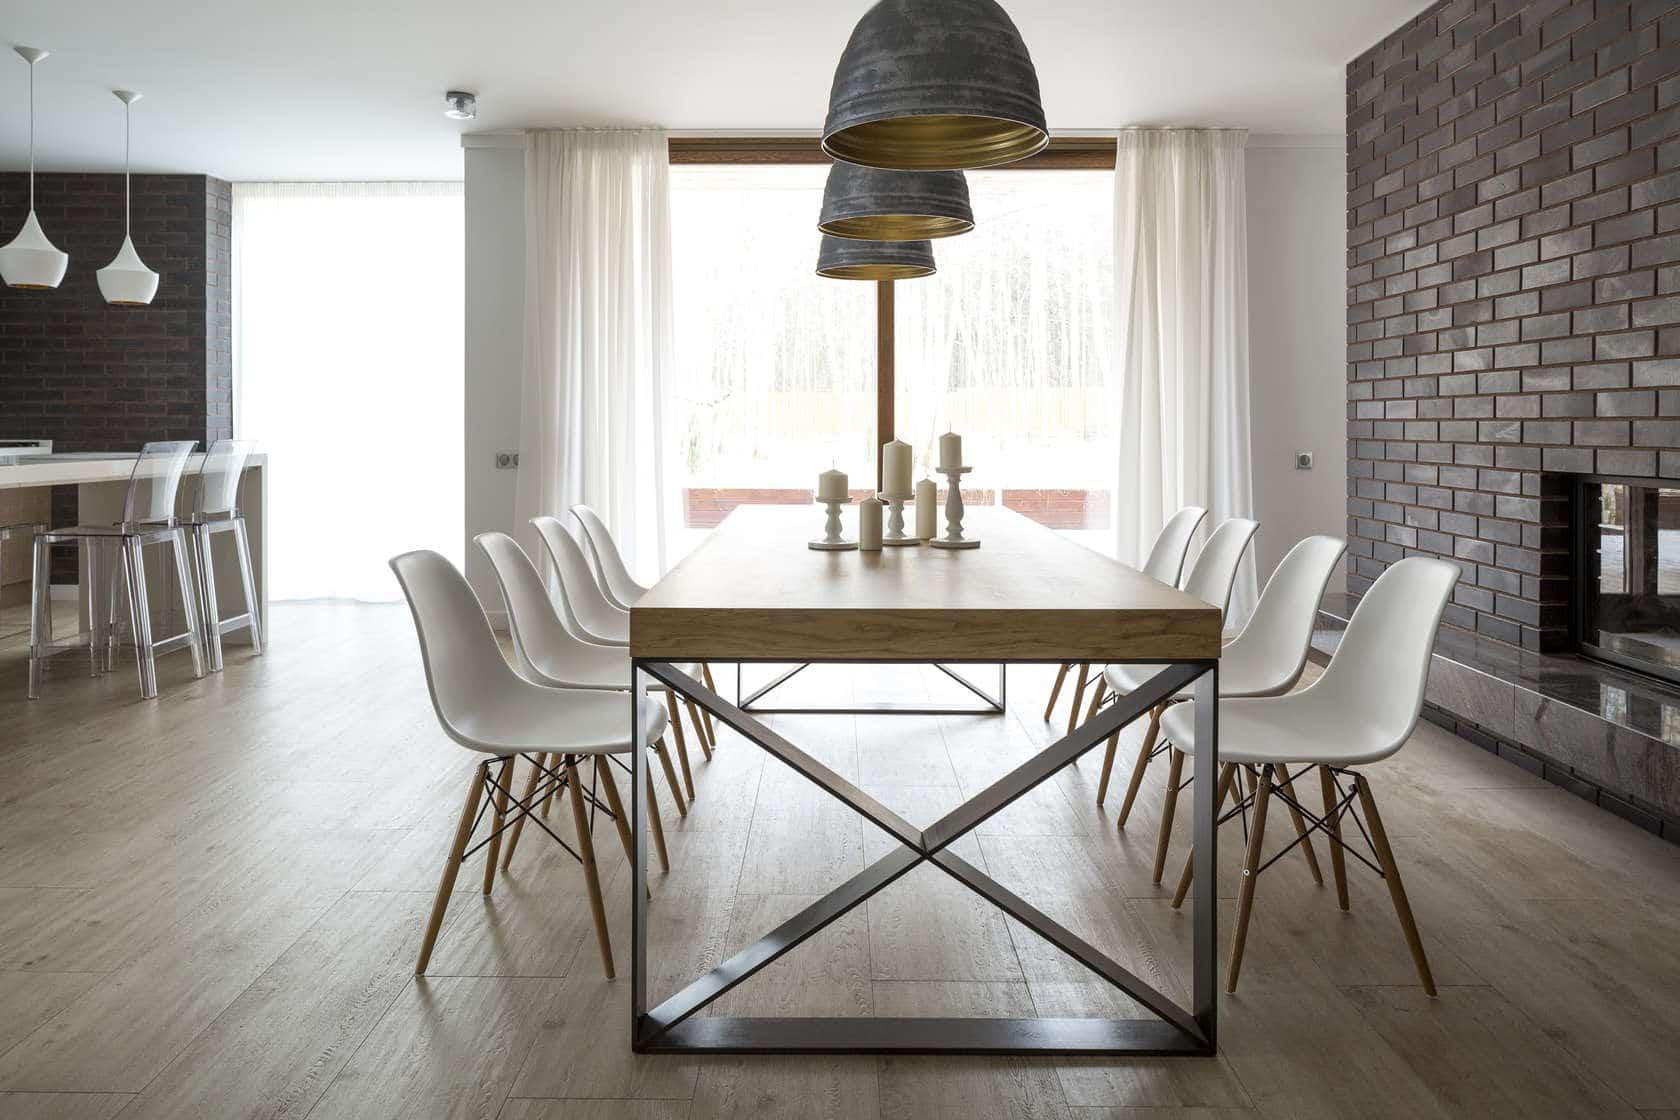 De Madera Diseño Dos Casa Pisos rdCBeoWxQ